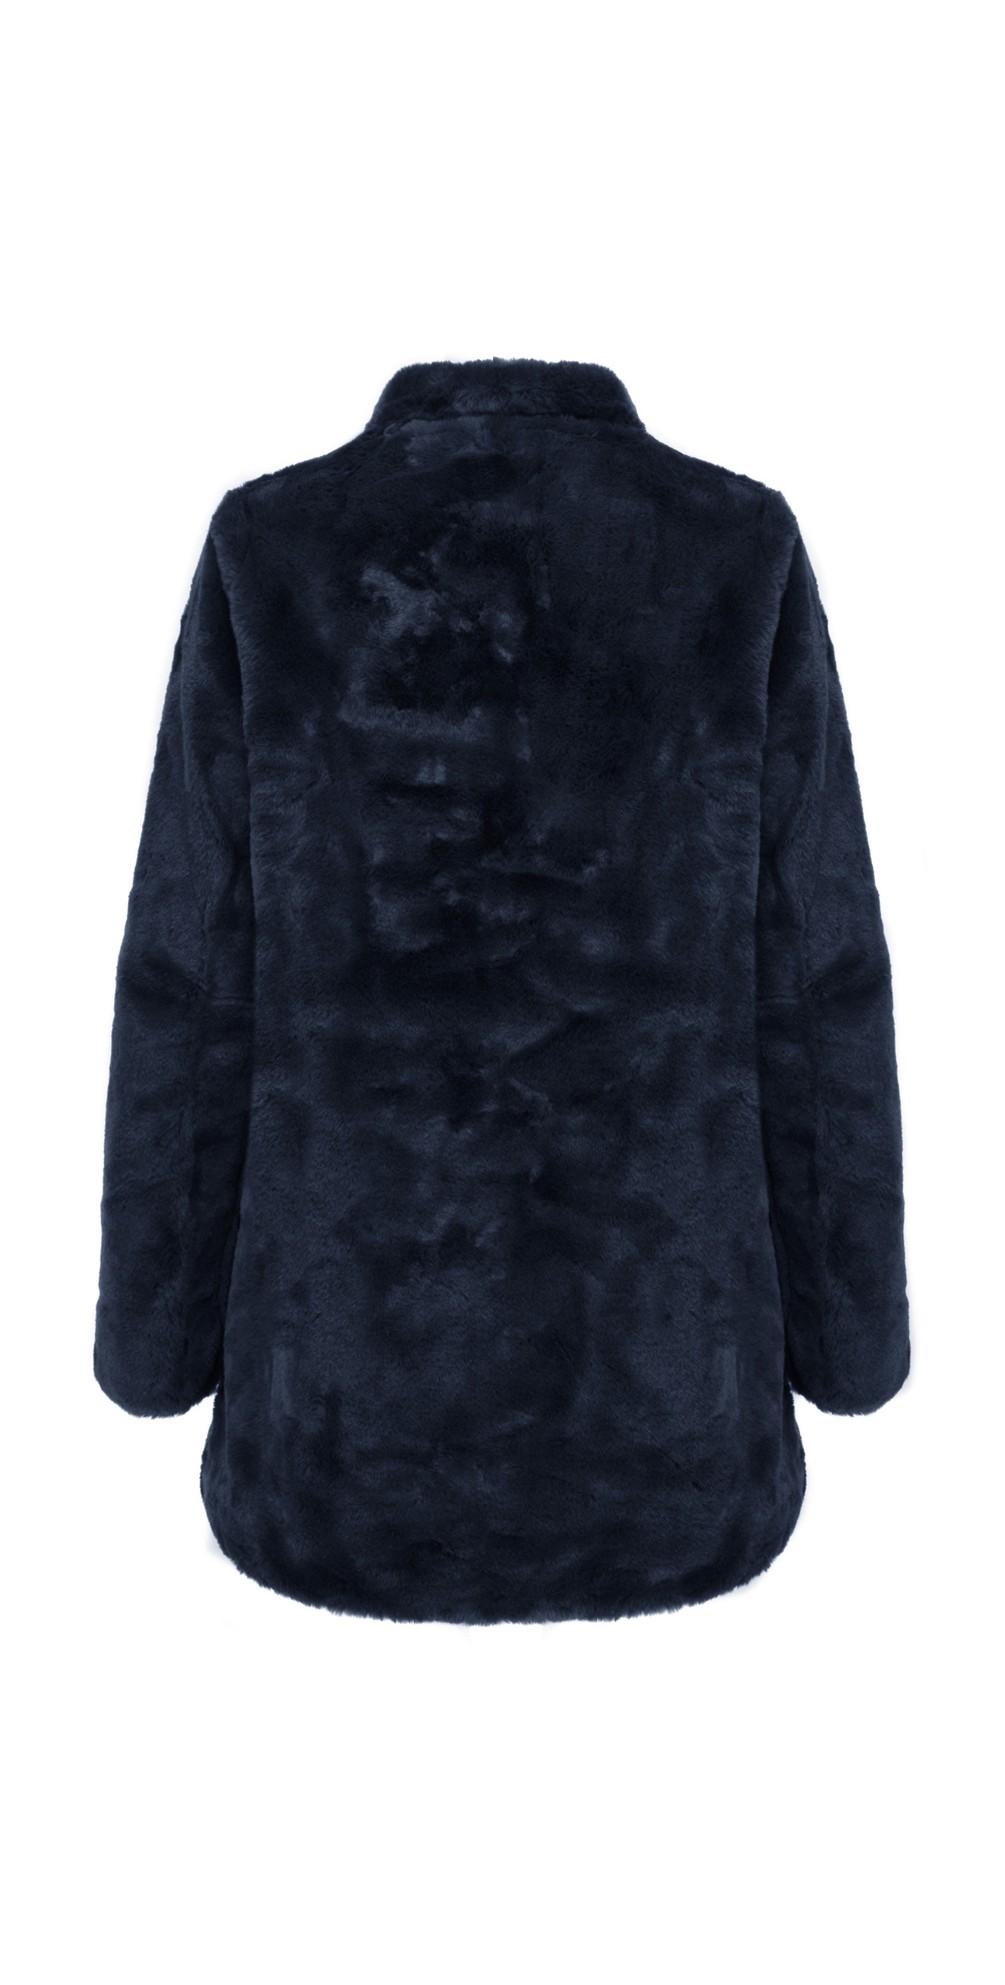 Nonna Faux Fur Coat main image